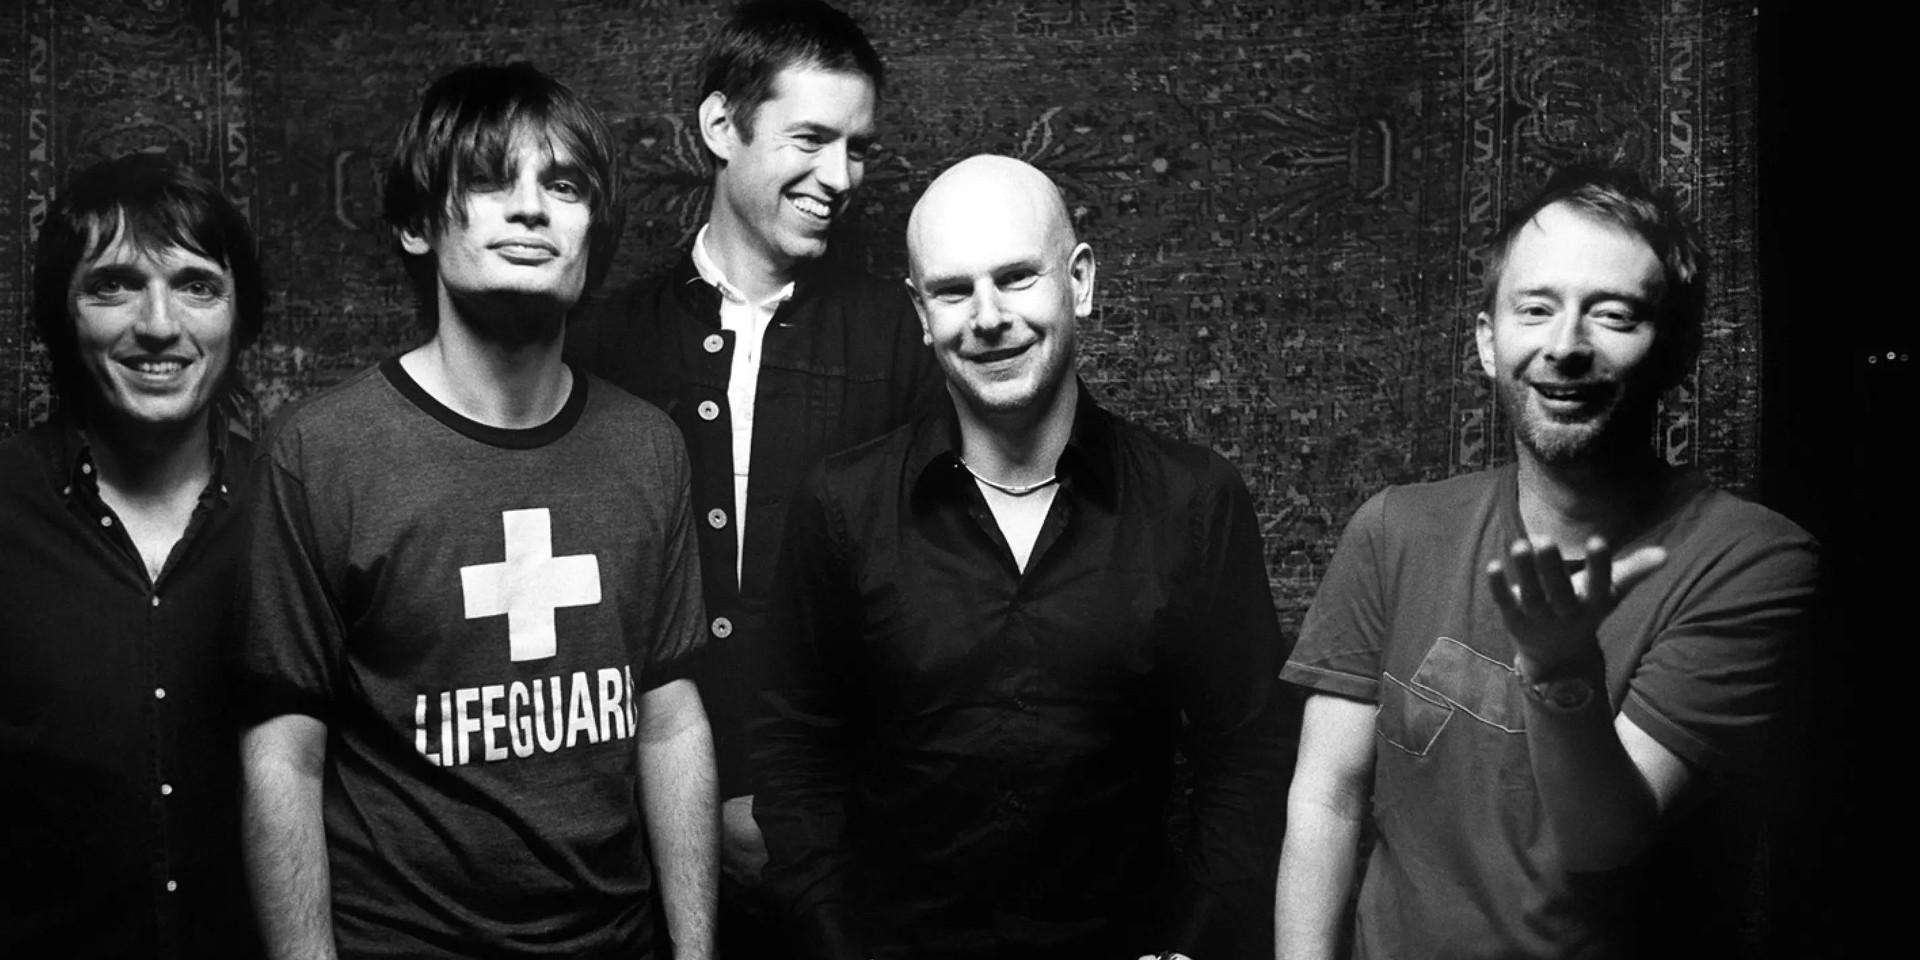 Radiohead to celebrate 21st anniversary of 'Kid A', 'Amnesiac' with new triple-album 'KID A MNESIA'